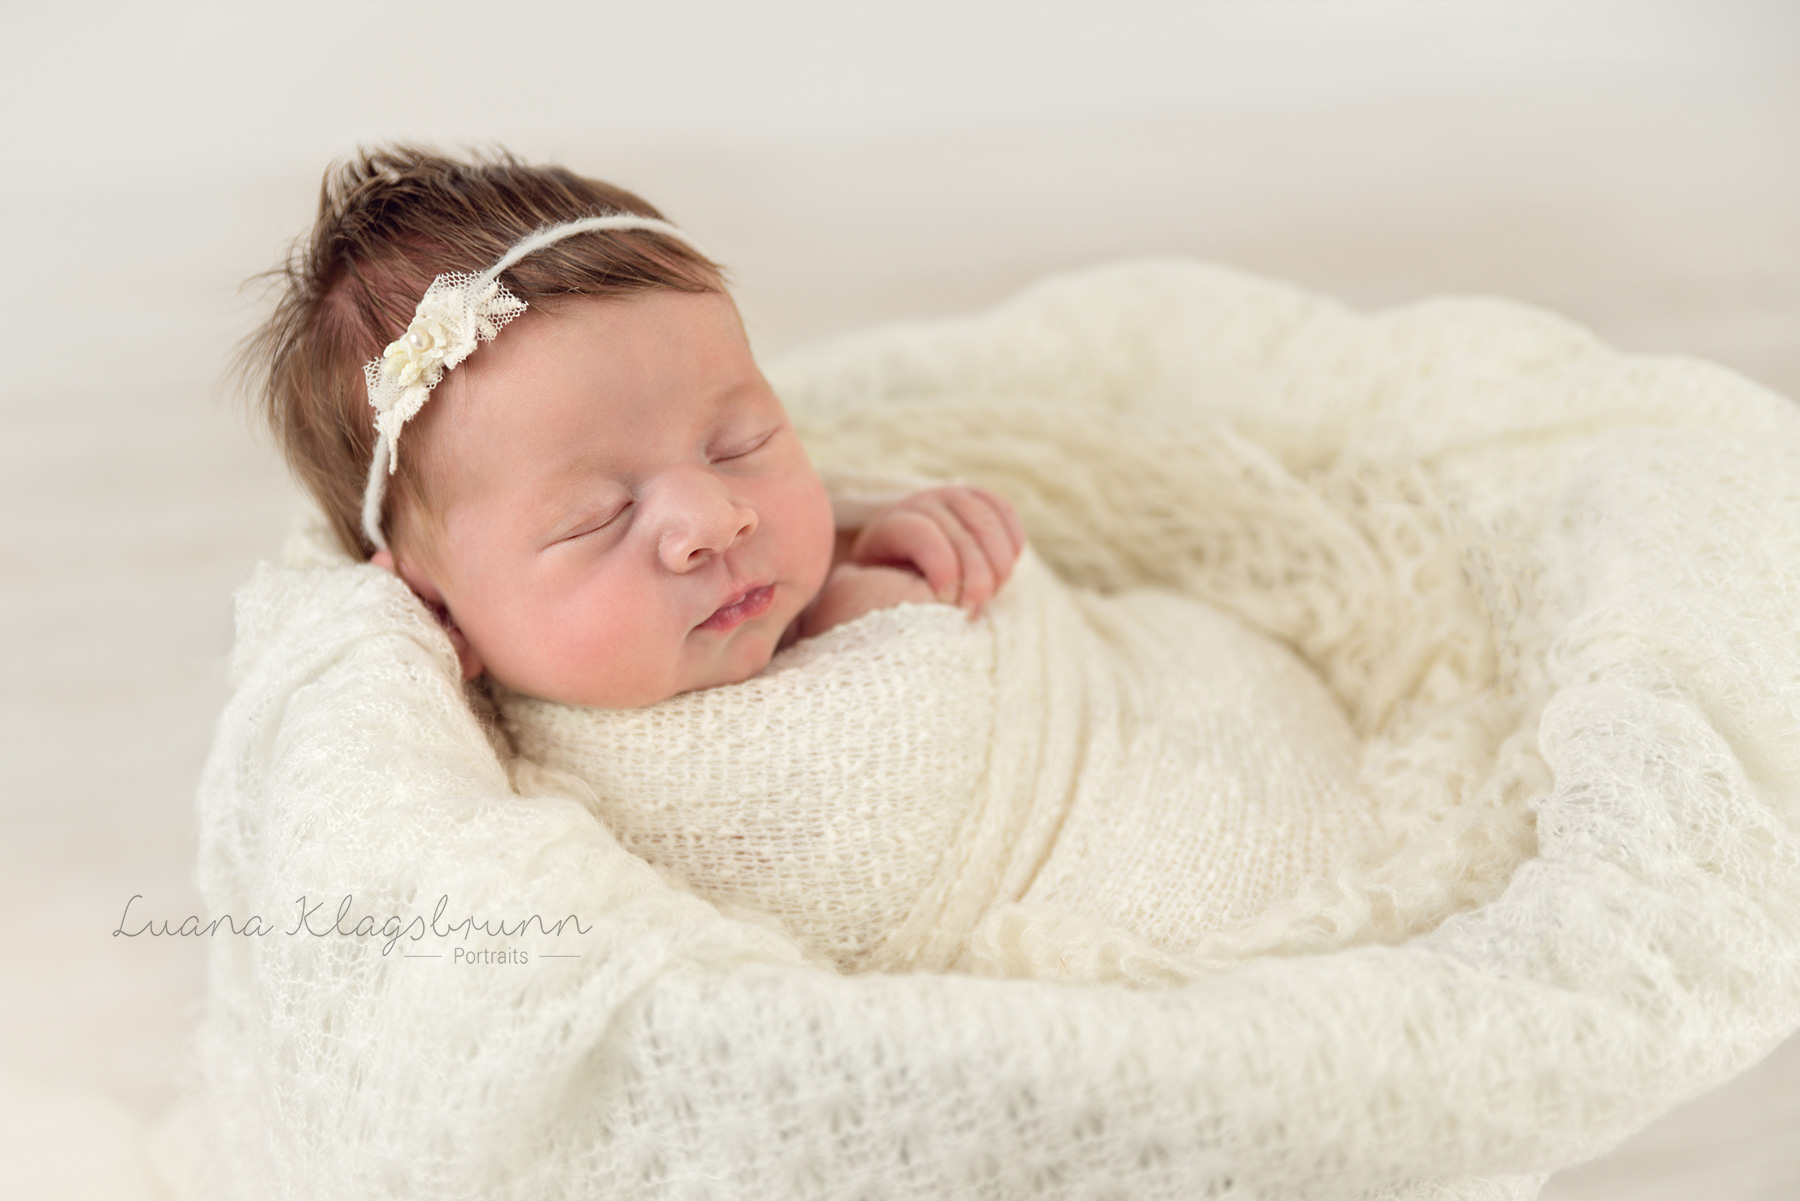 Babyfotografie Karlsruhe Luana Klagsbrunn6.jpg